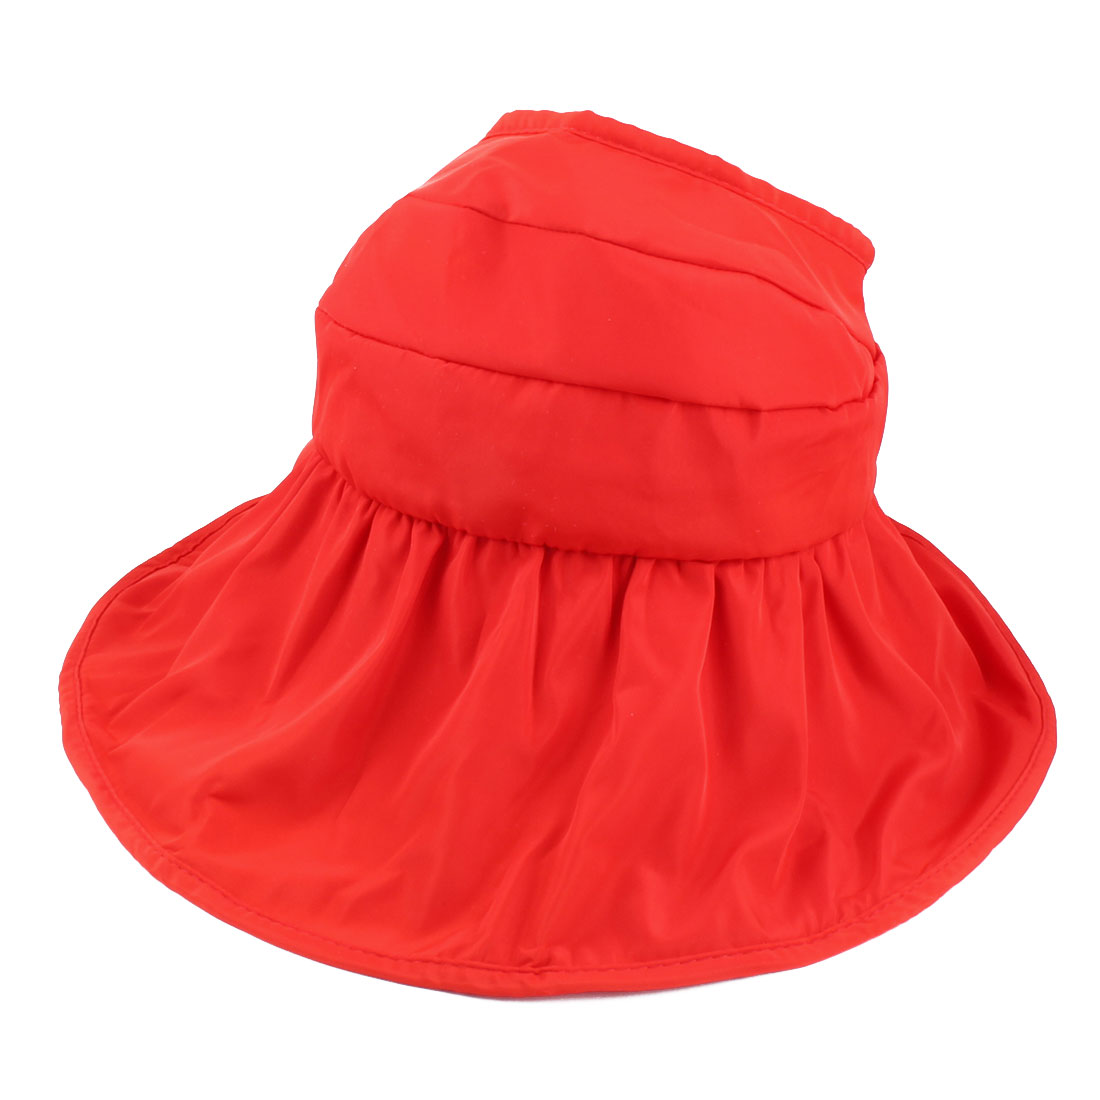 Summer-Outdoor-Roll-Up-Wide-Floppy-Brim-Foldable-Visor-Cap-Sun-Protector-Hat